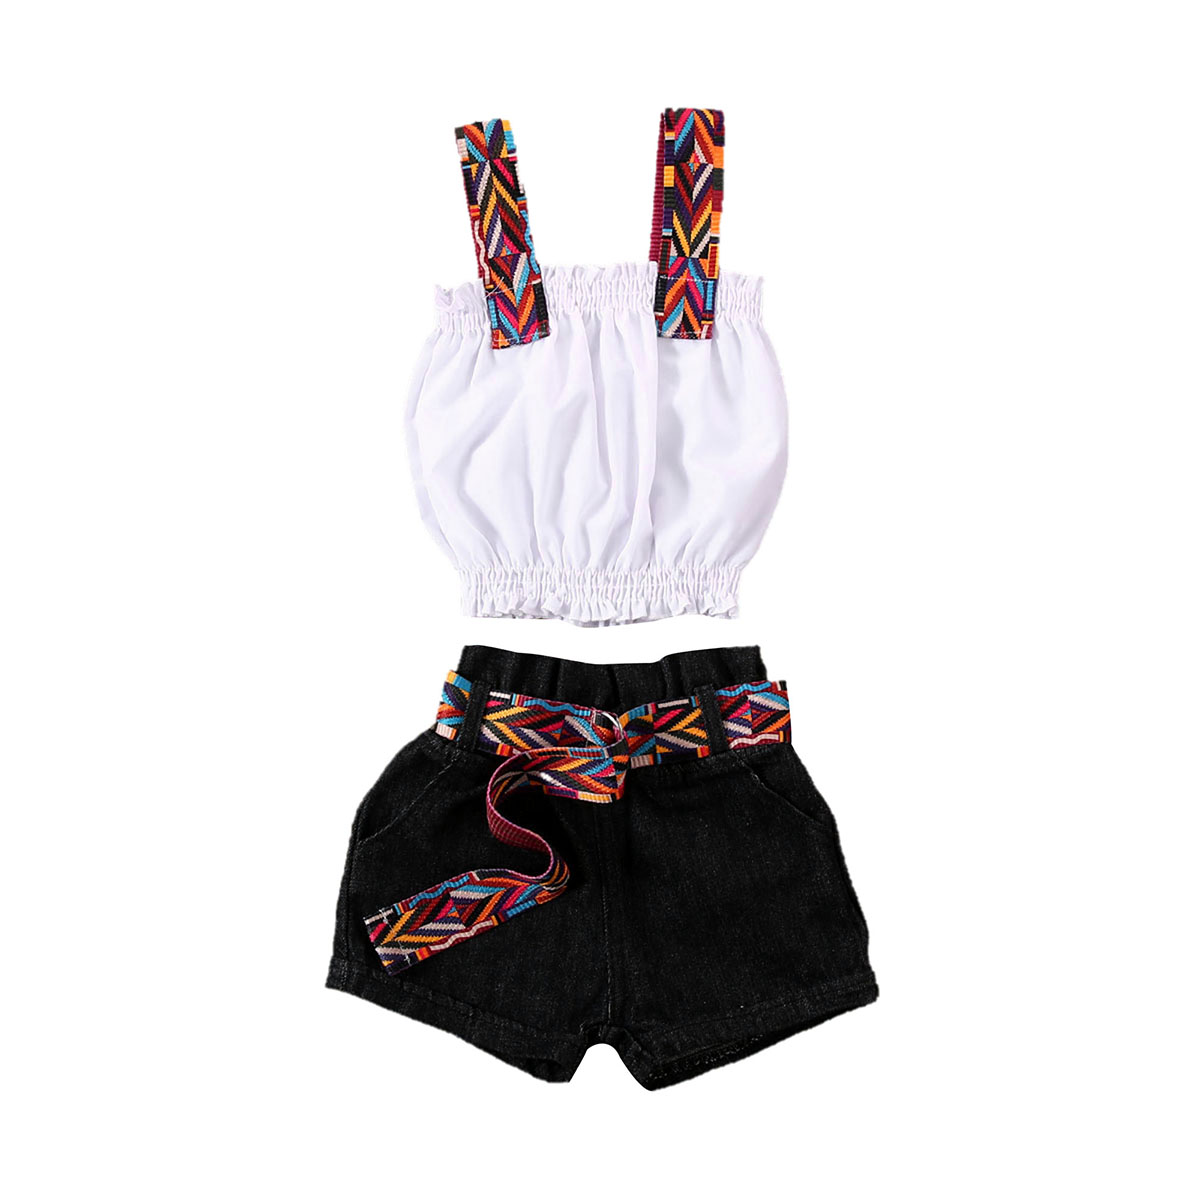 2020 Kids Toddler Baby Girl ummer outfit Spaghetti Strap White Crop Tops Vest Black Belt Shorts Jeans Pants  Fashion 2PCS Set 7